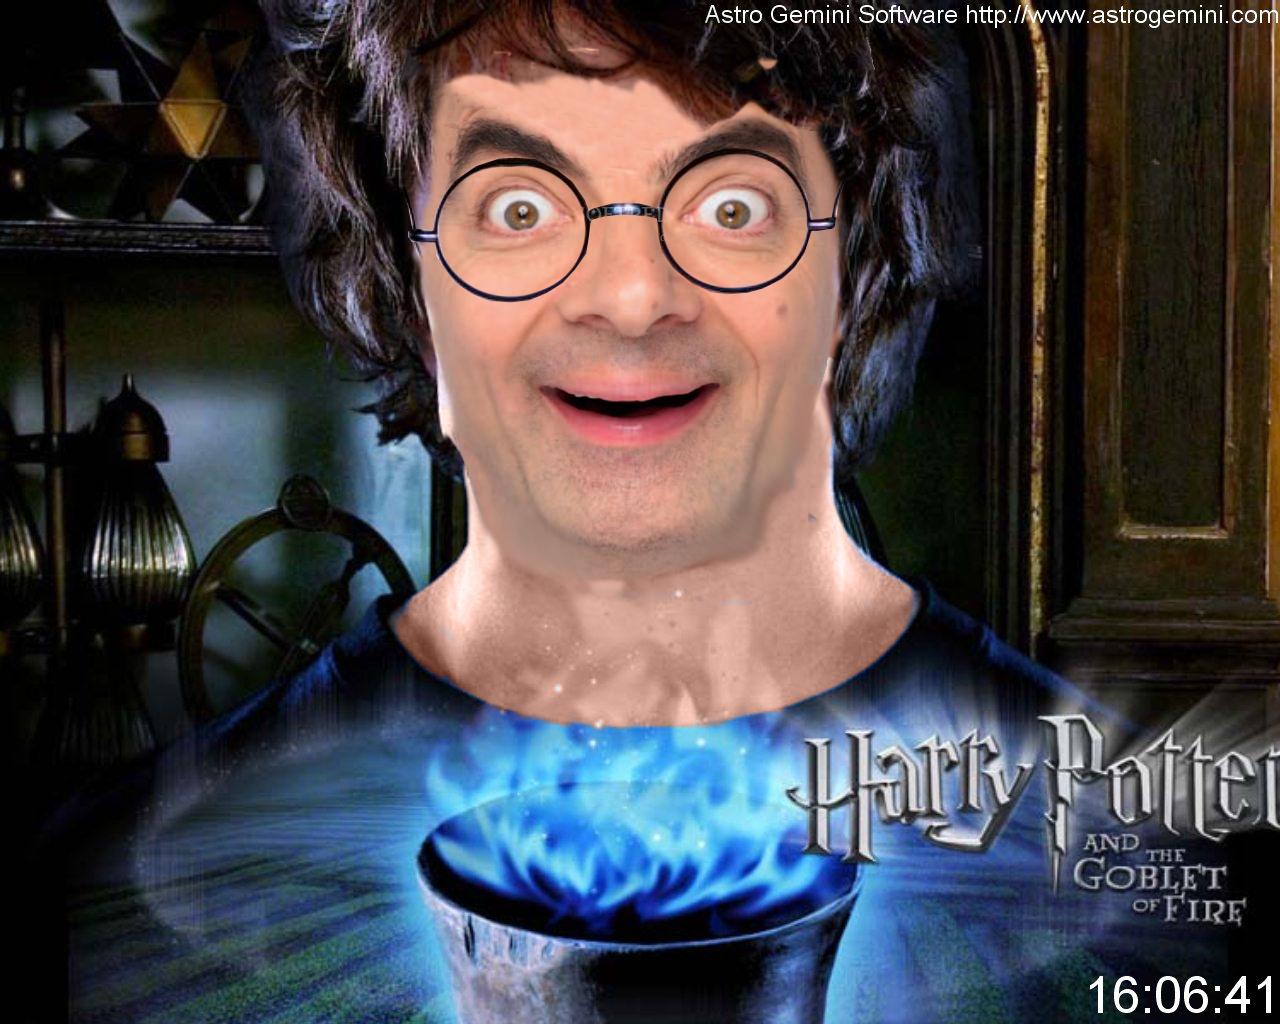 http://3.bp.blogspot.com/_MHkTzwBkew4/TNo-izEIYLI/AAAAAAAAAME/5UtD_dvBNgw/s1600/Mr_bean_Harry_potter_by_alexdarkred.jpg